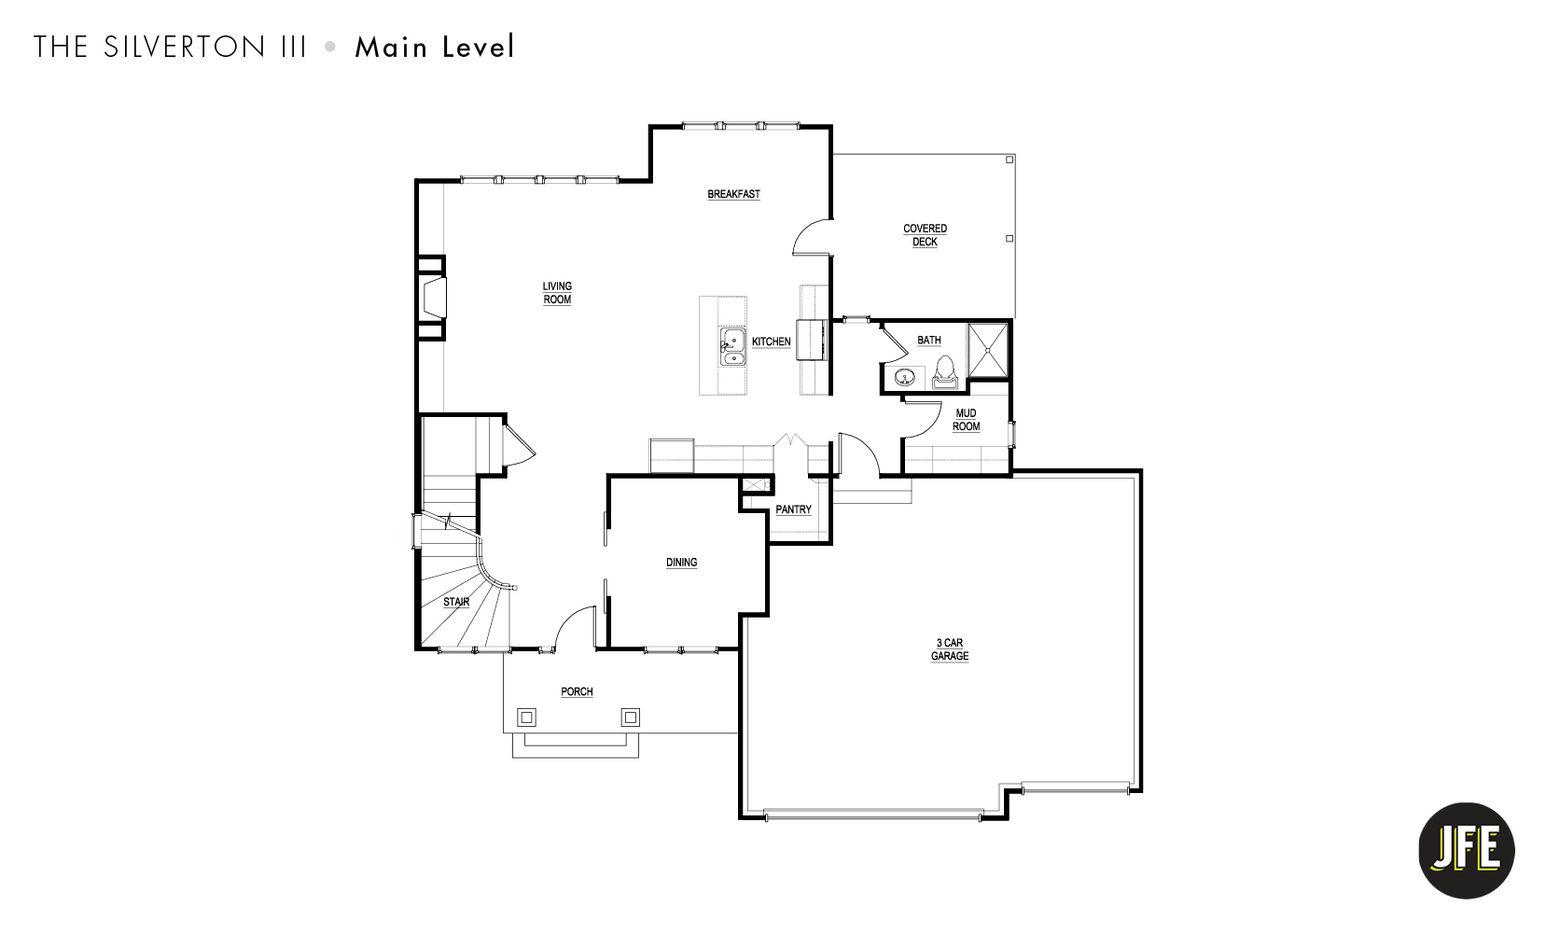 The-Silverton-III-Main-Level.jpg